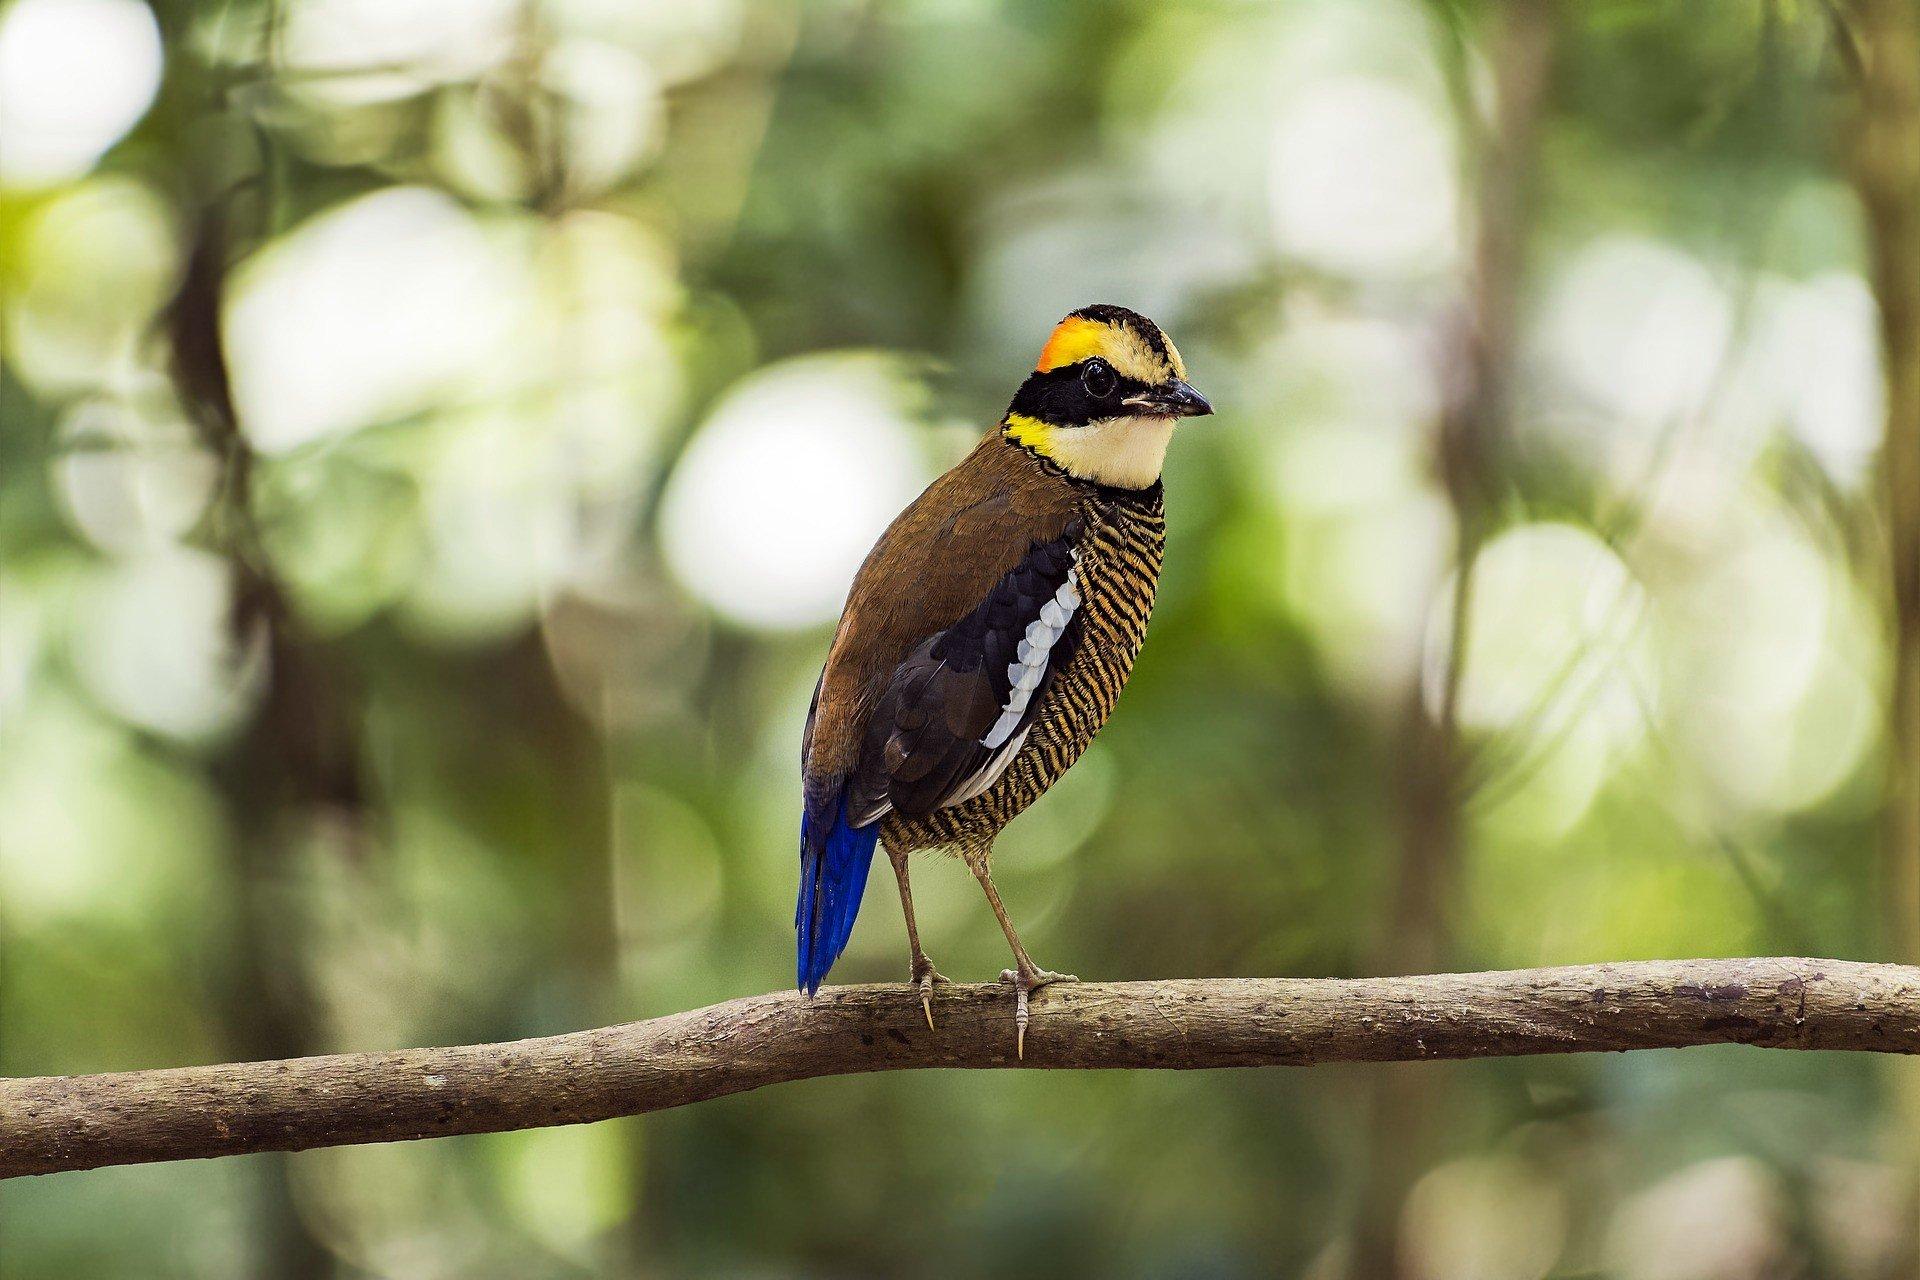 Jerantut is the access point to Taman Negara National Park